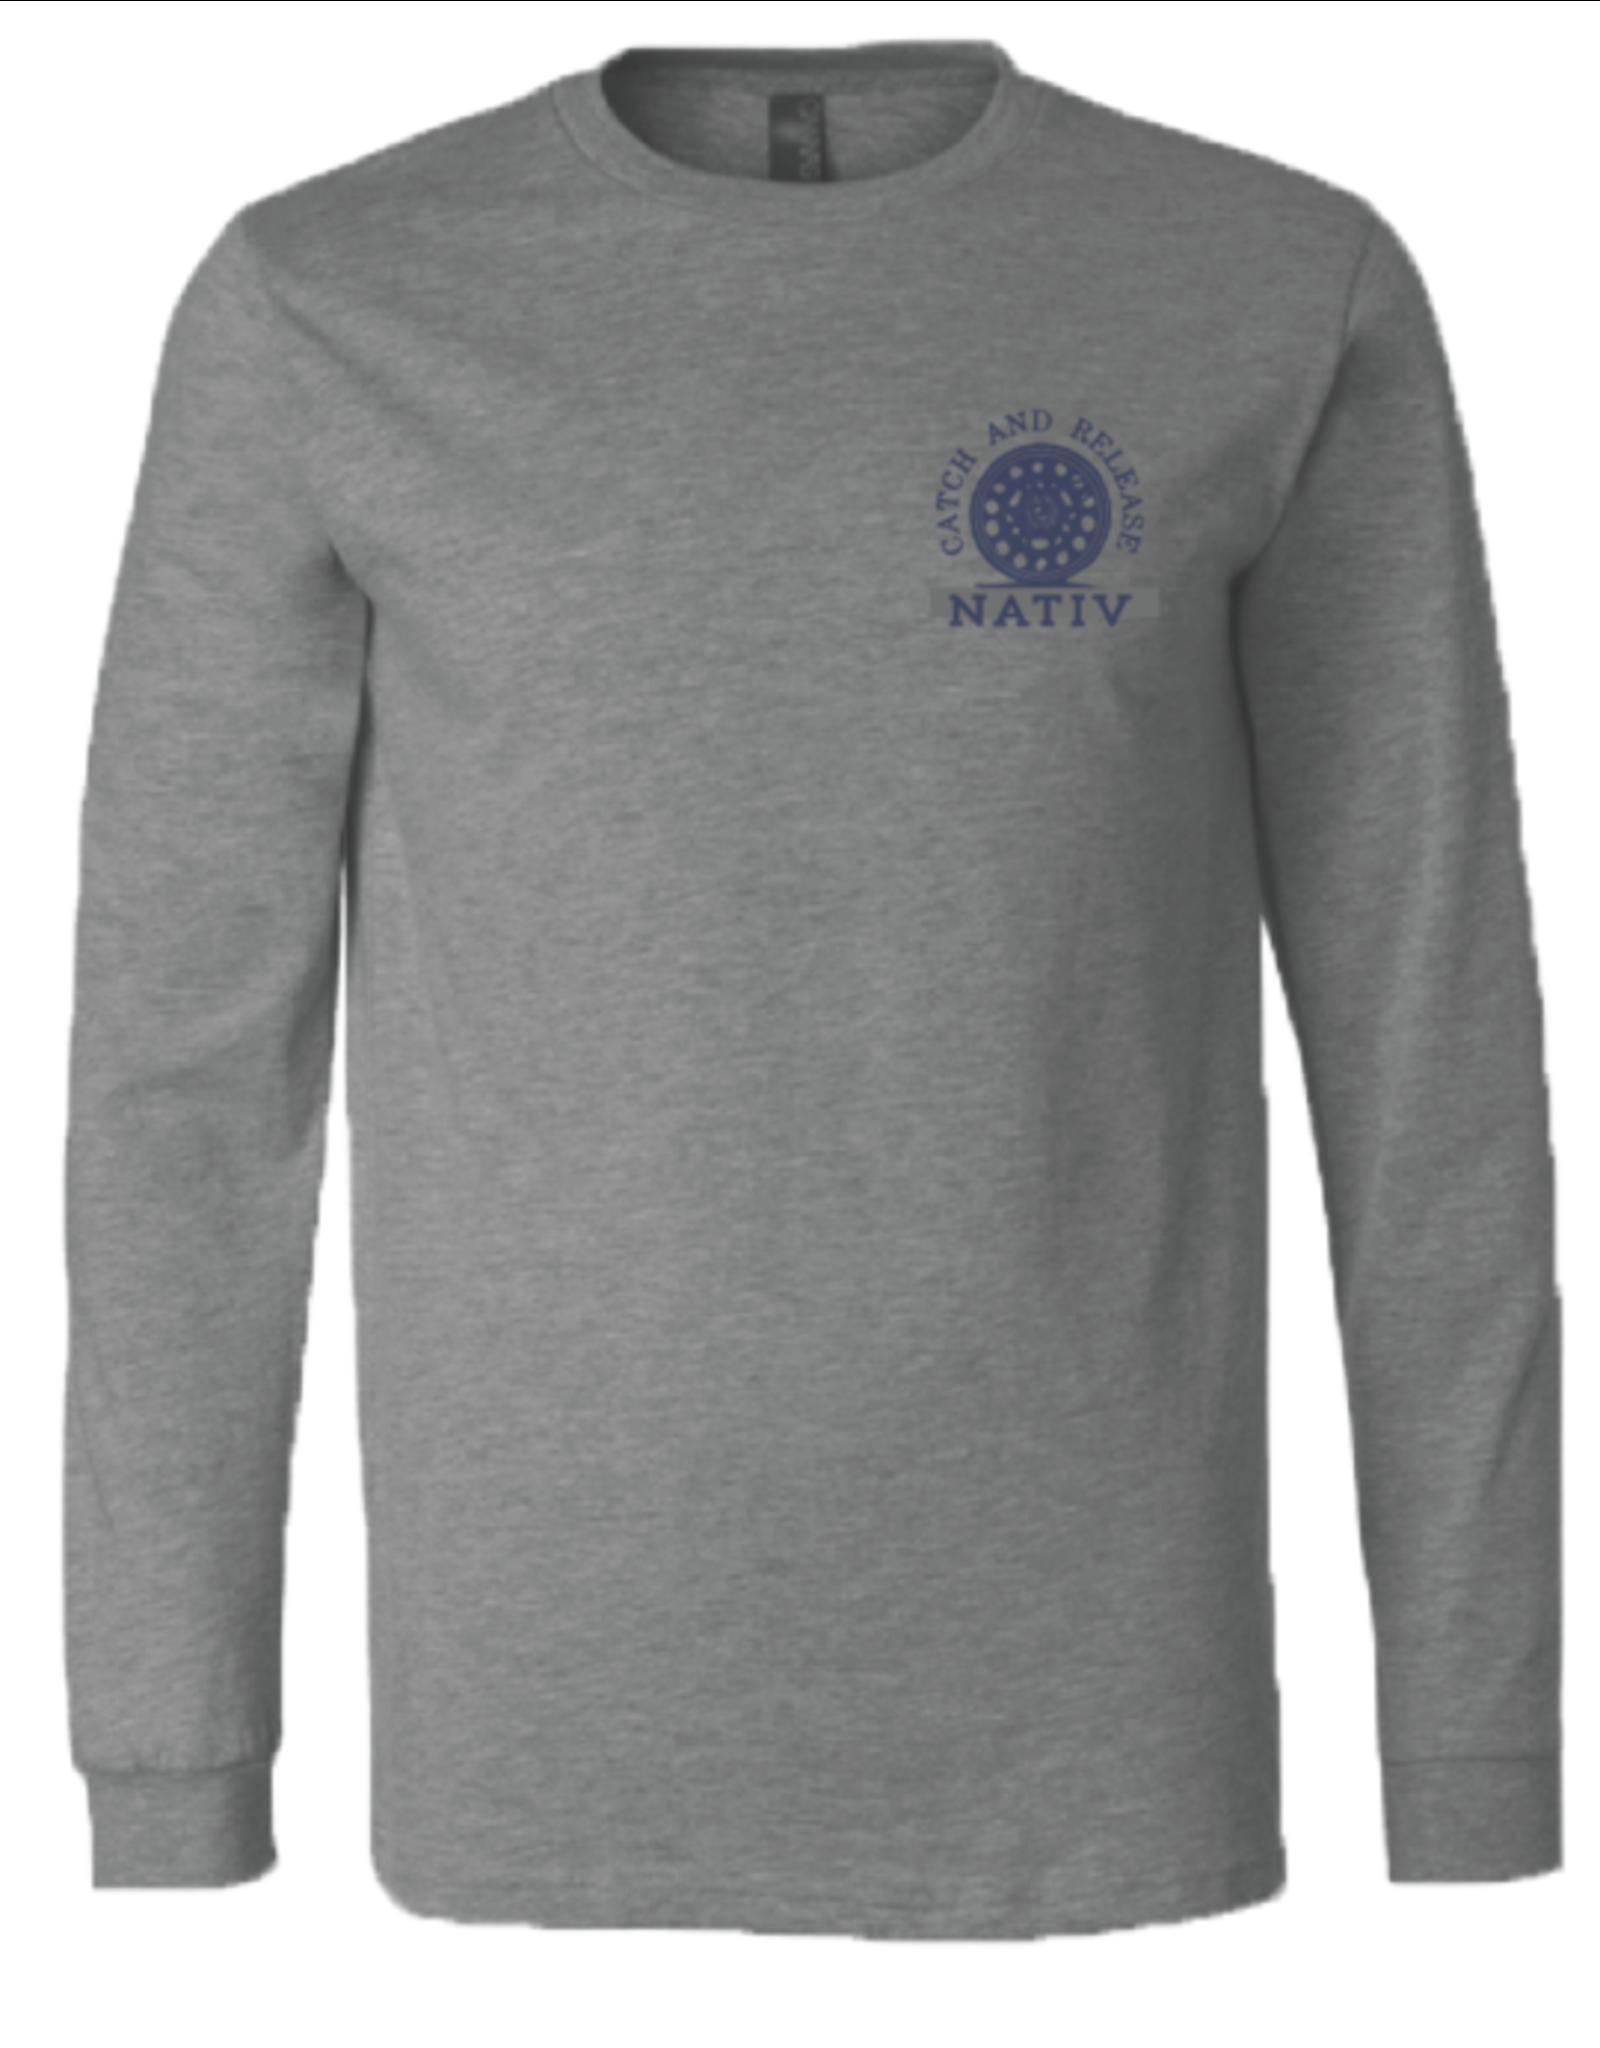 Nativ Nativ Topo Trout L/S T-Shirt